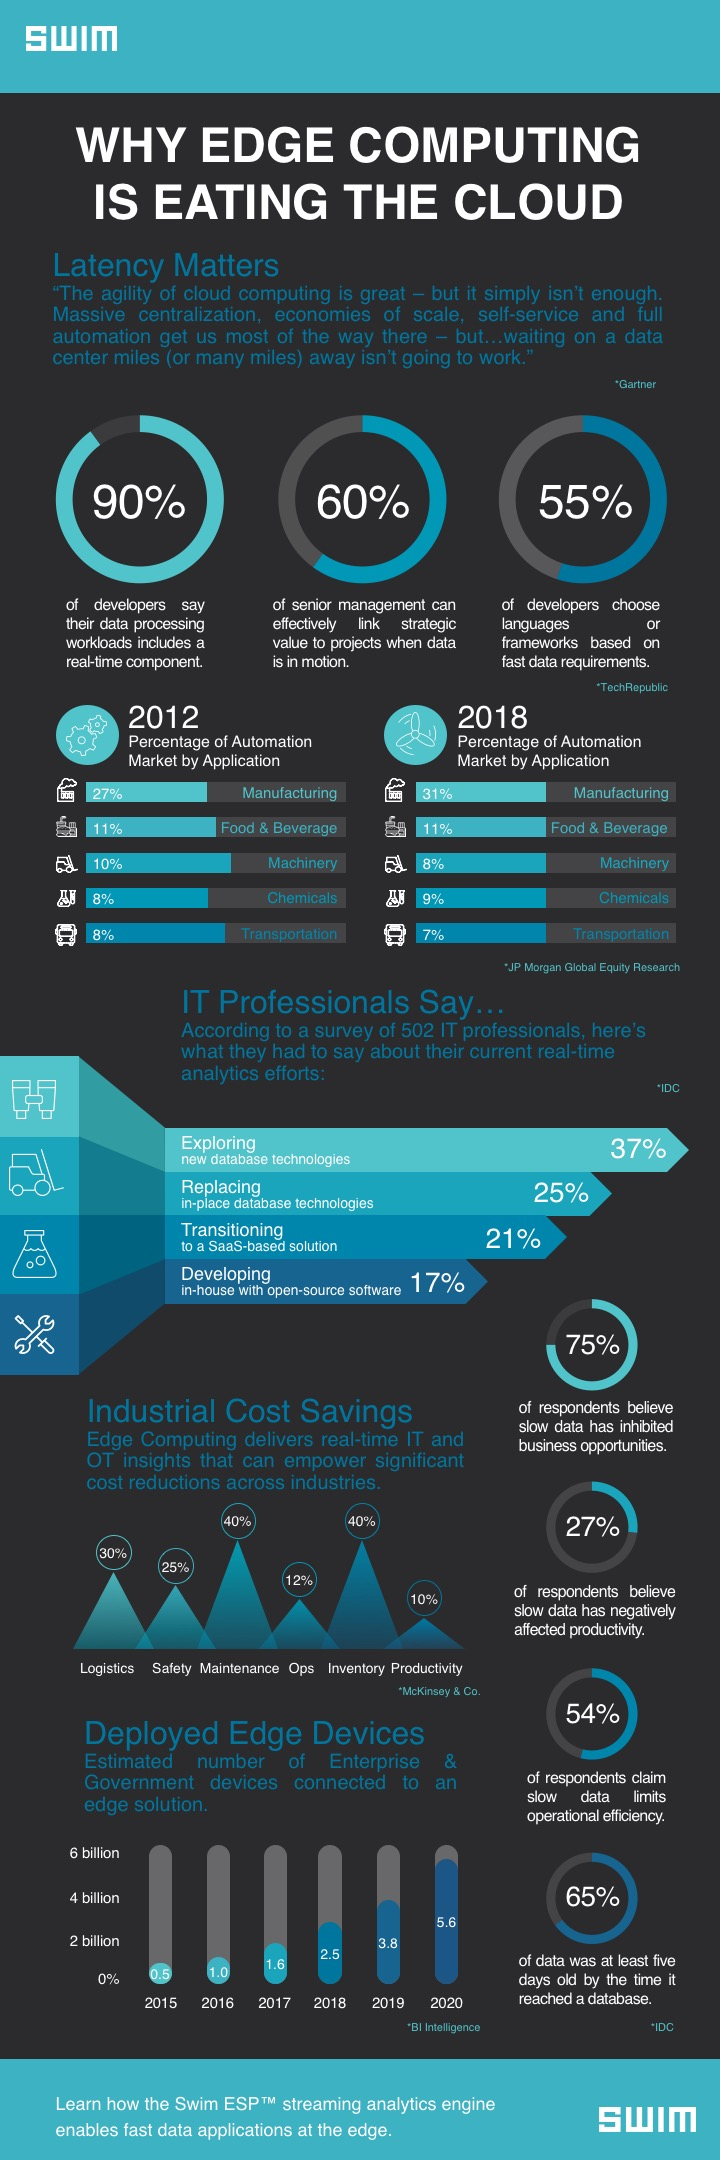 Why Edge Computing is Eating the Cloud (Edge Computing Infographic)   Swim Inc.